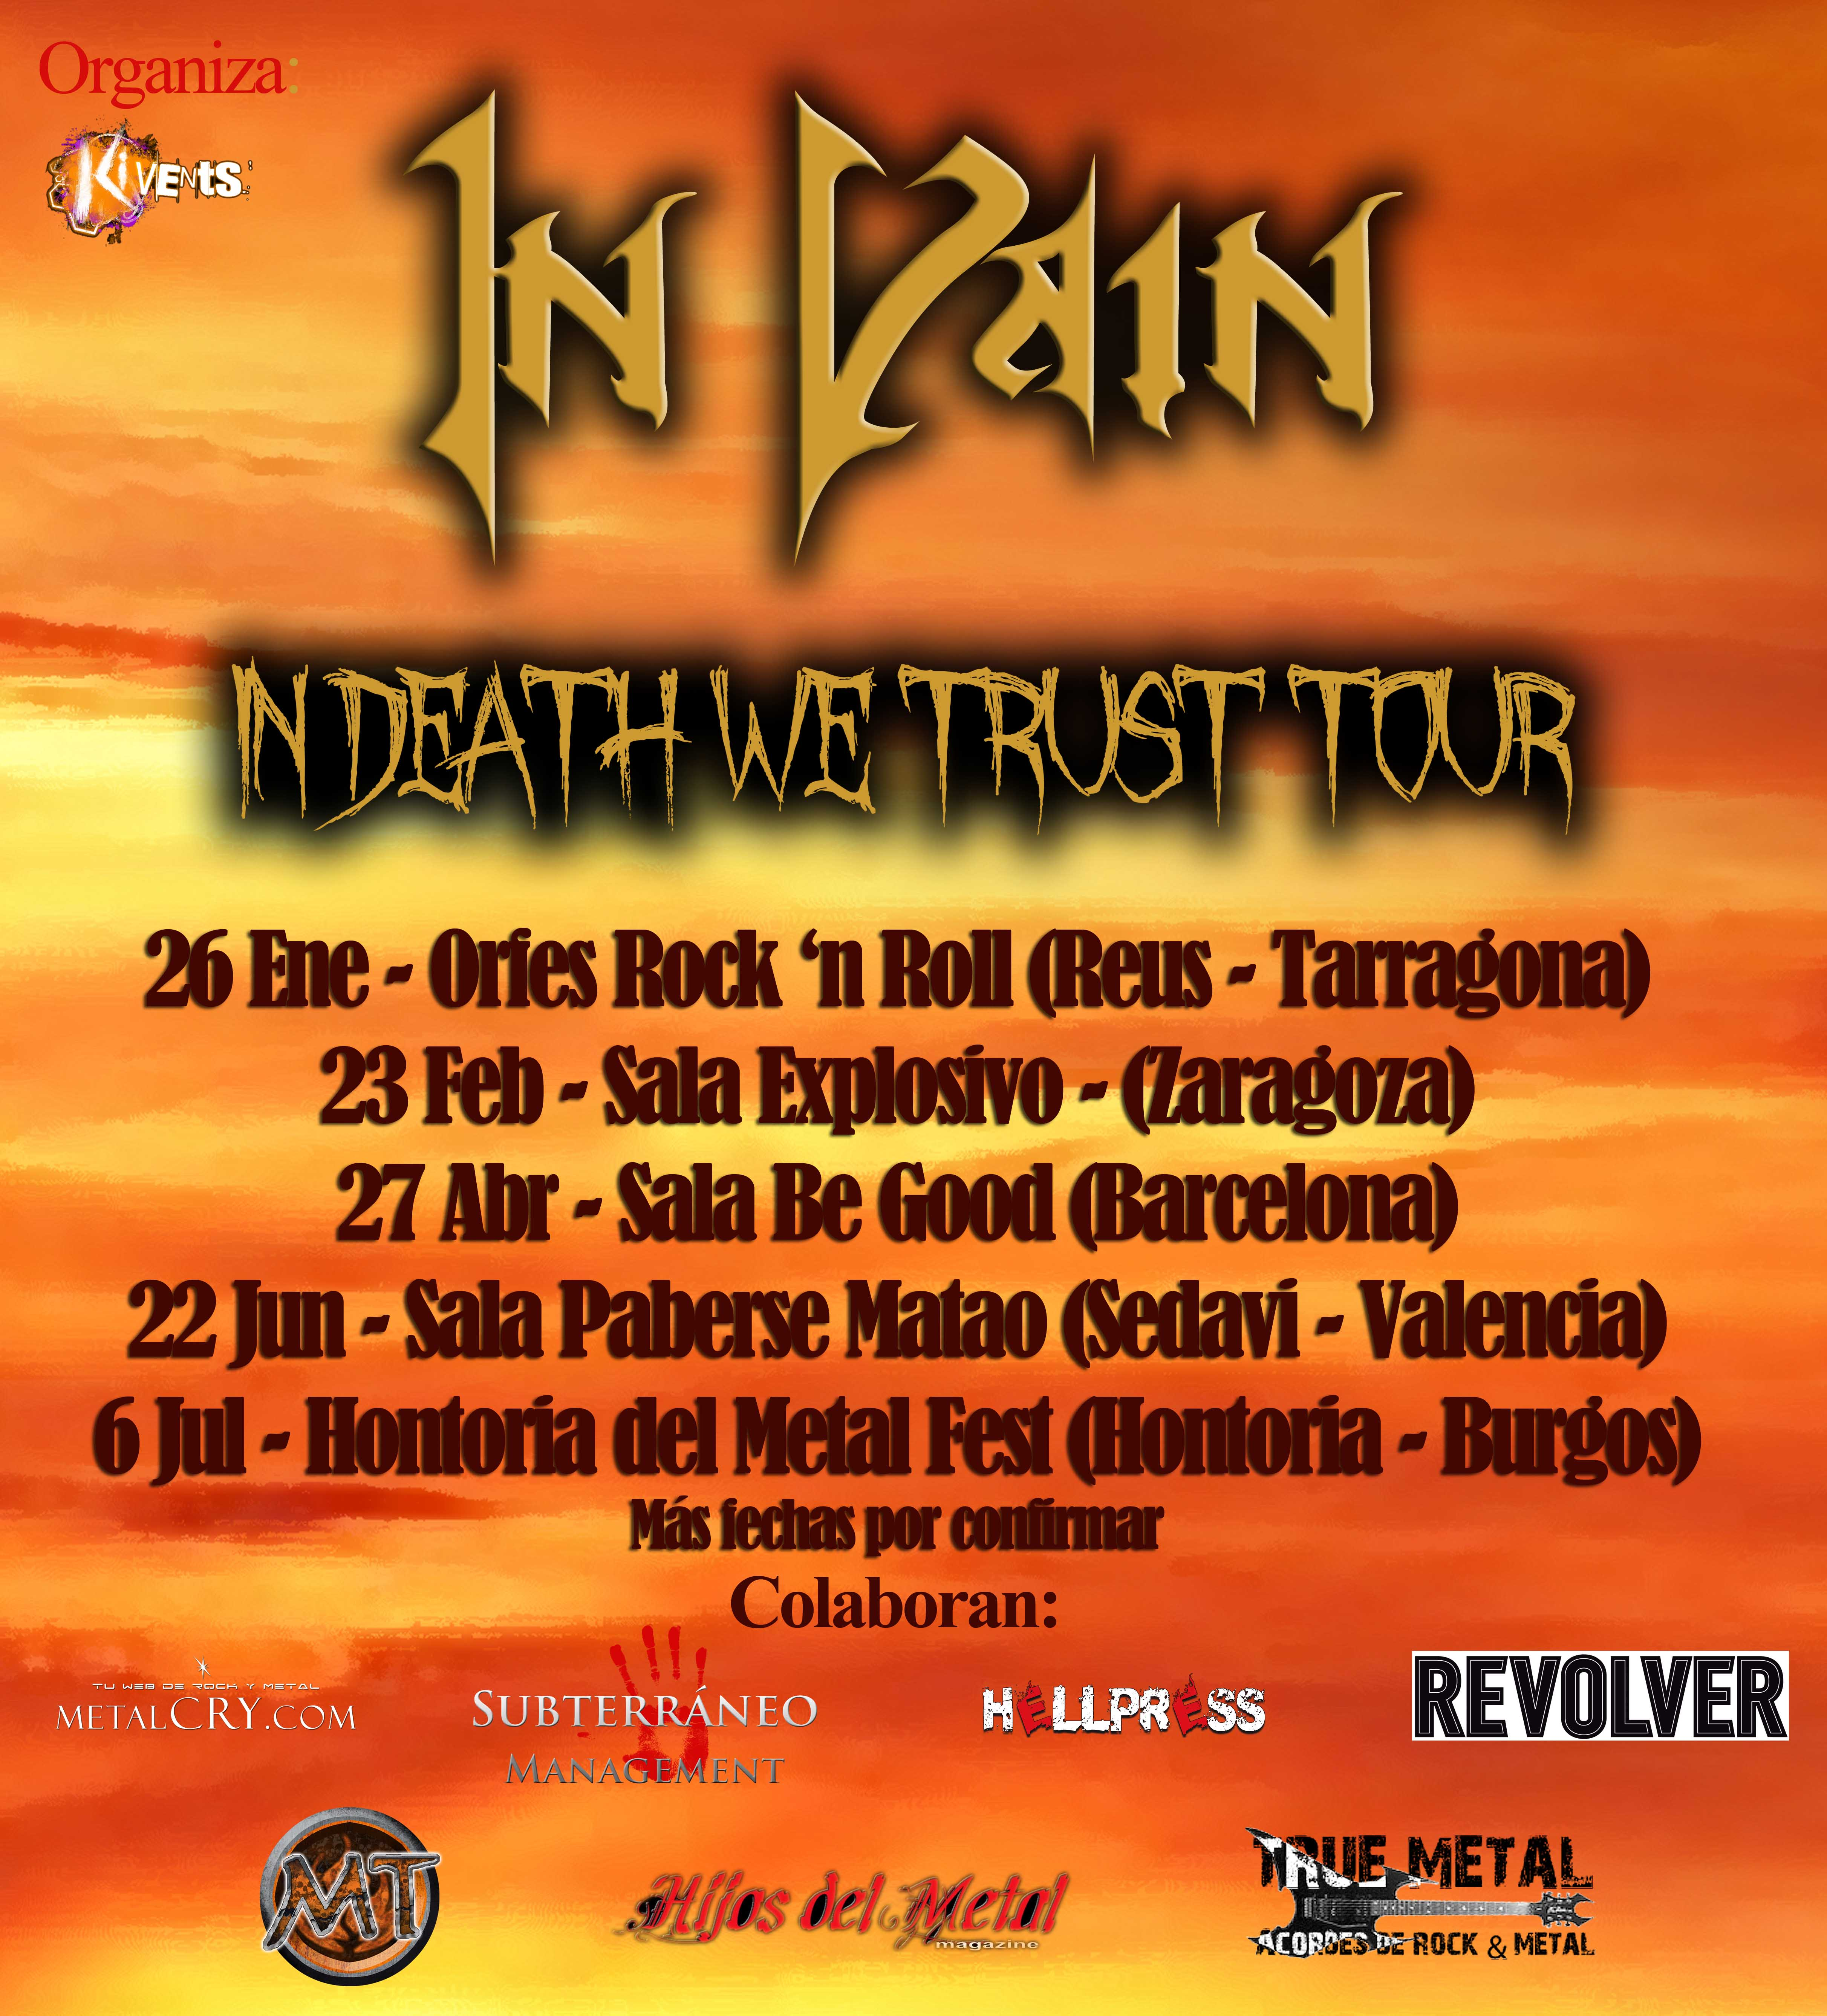 In Vain - In Death We Trust Tour 2013